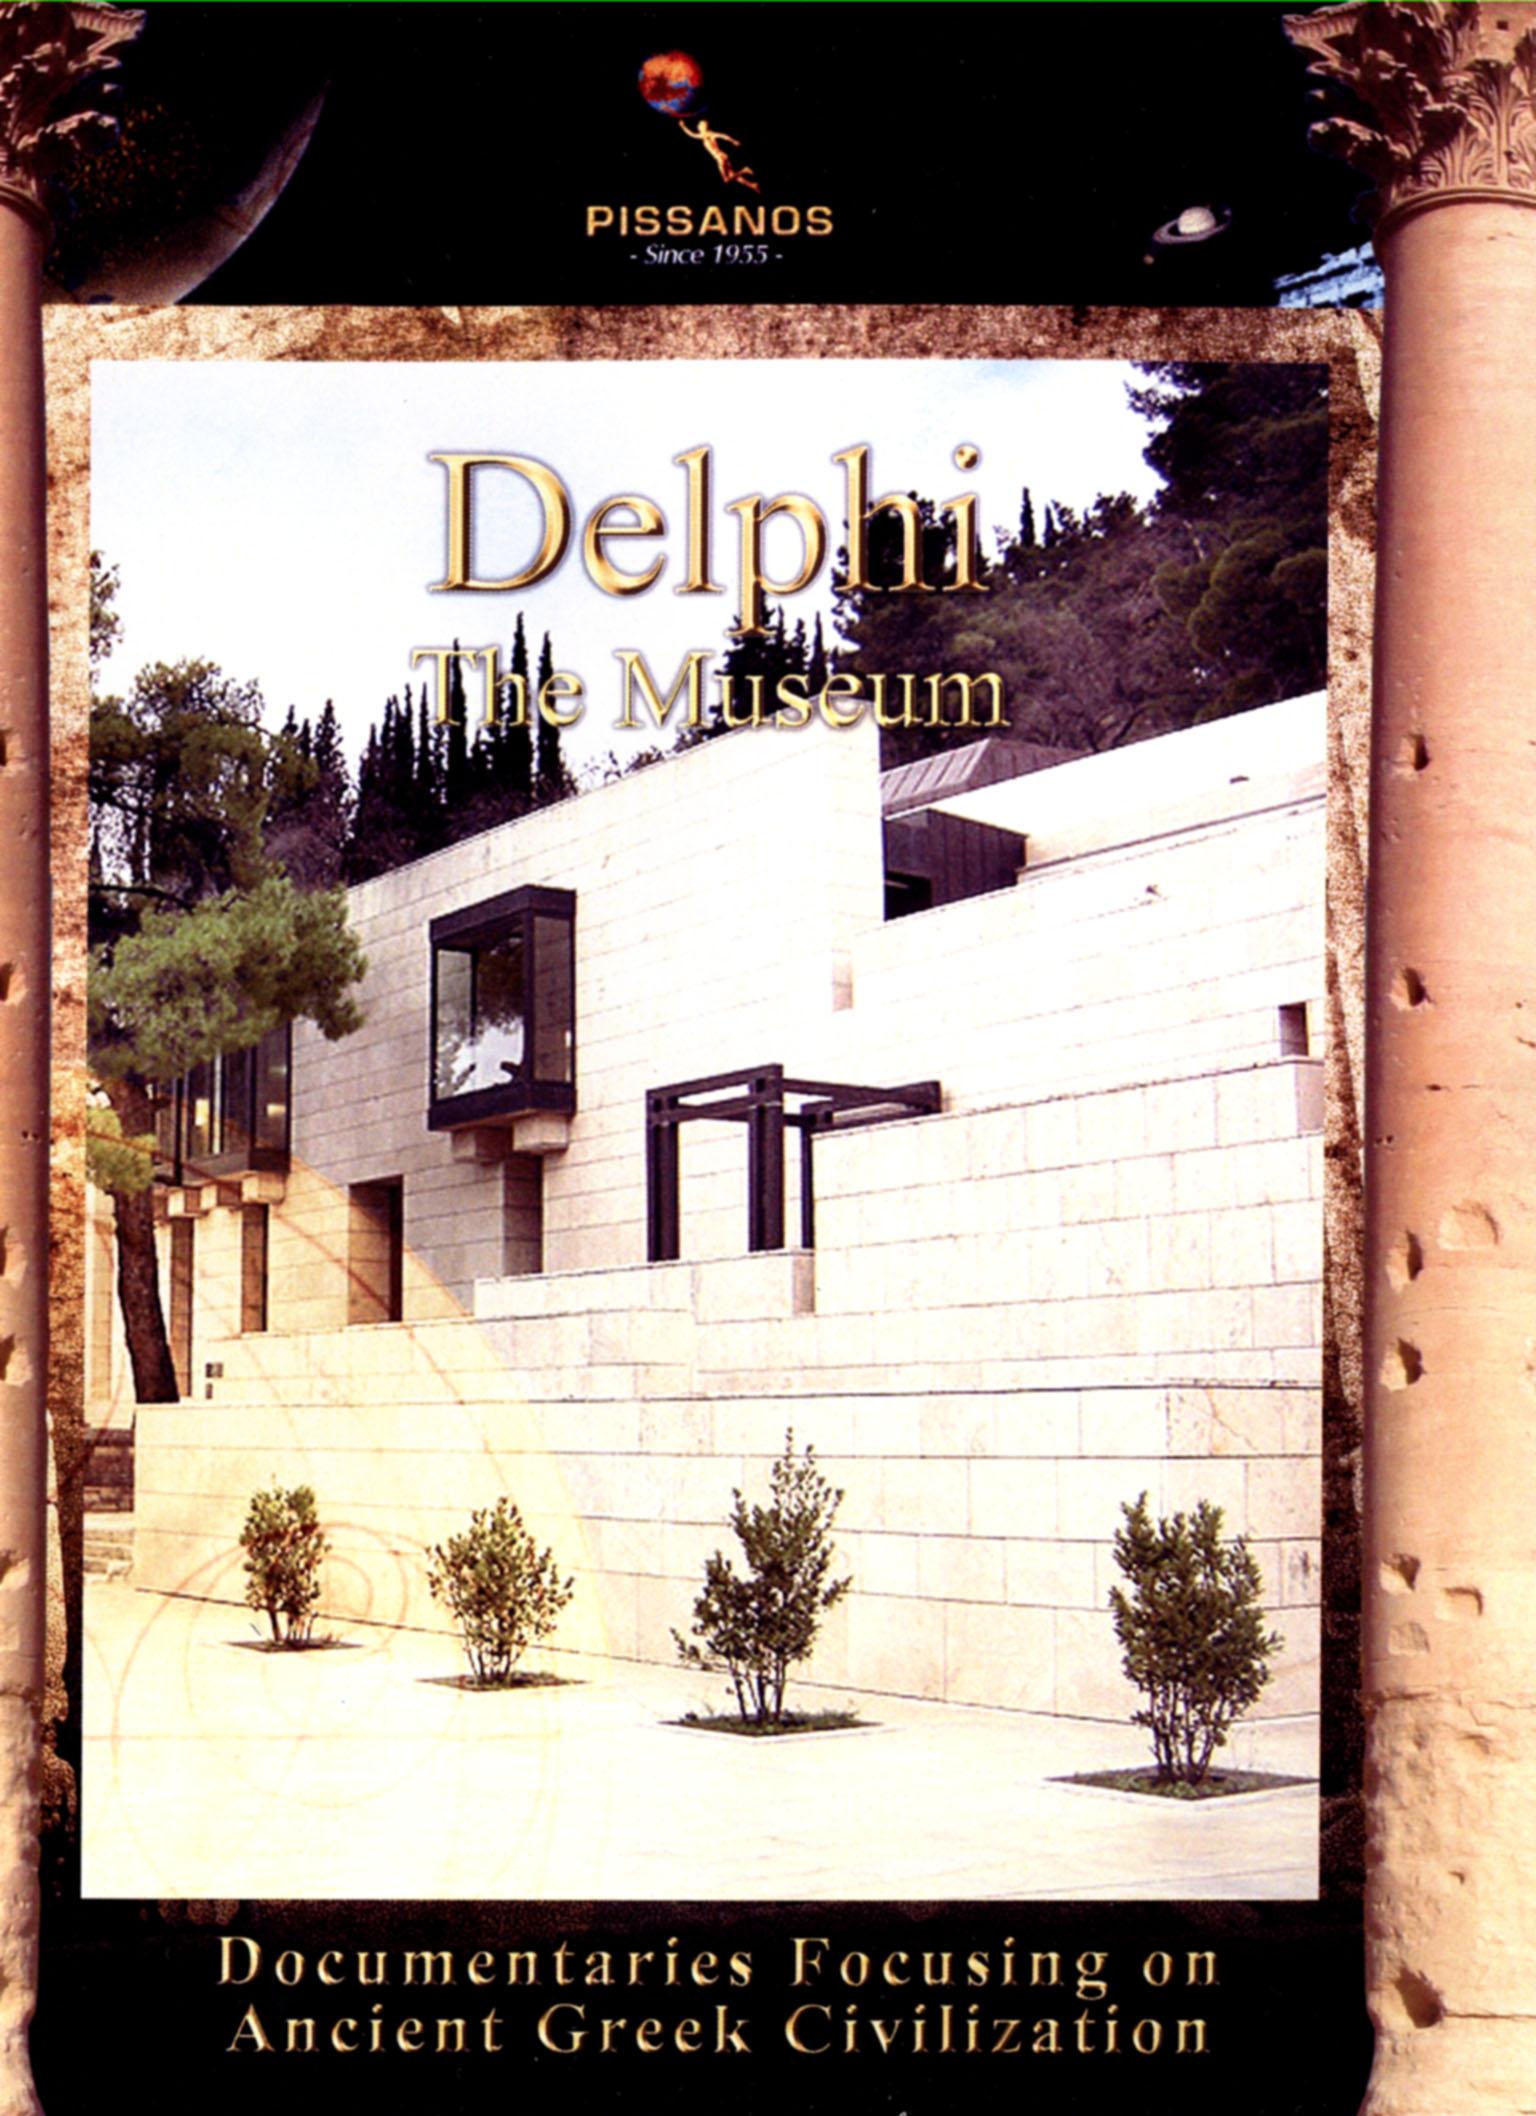 Delphi - The Museum